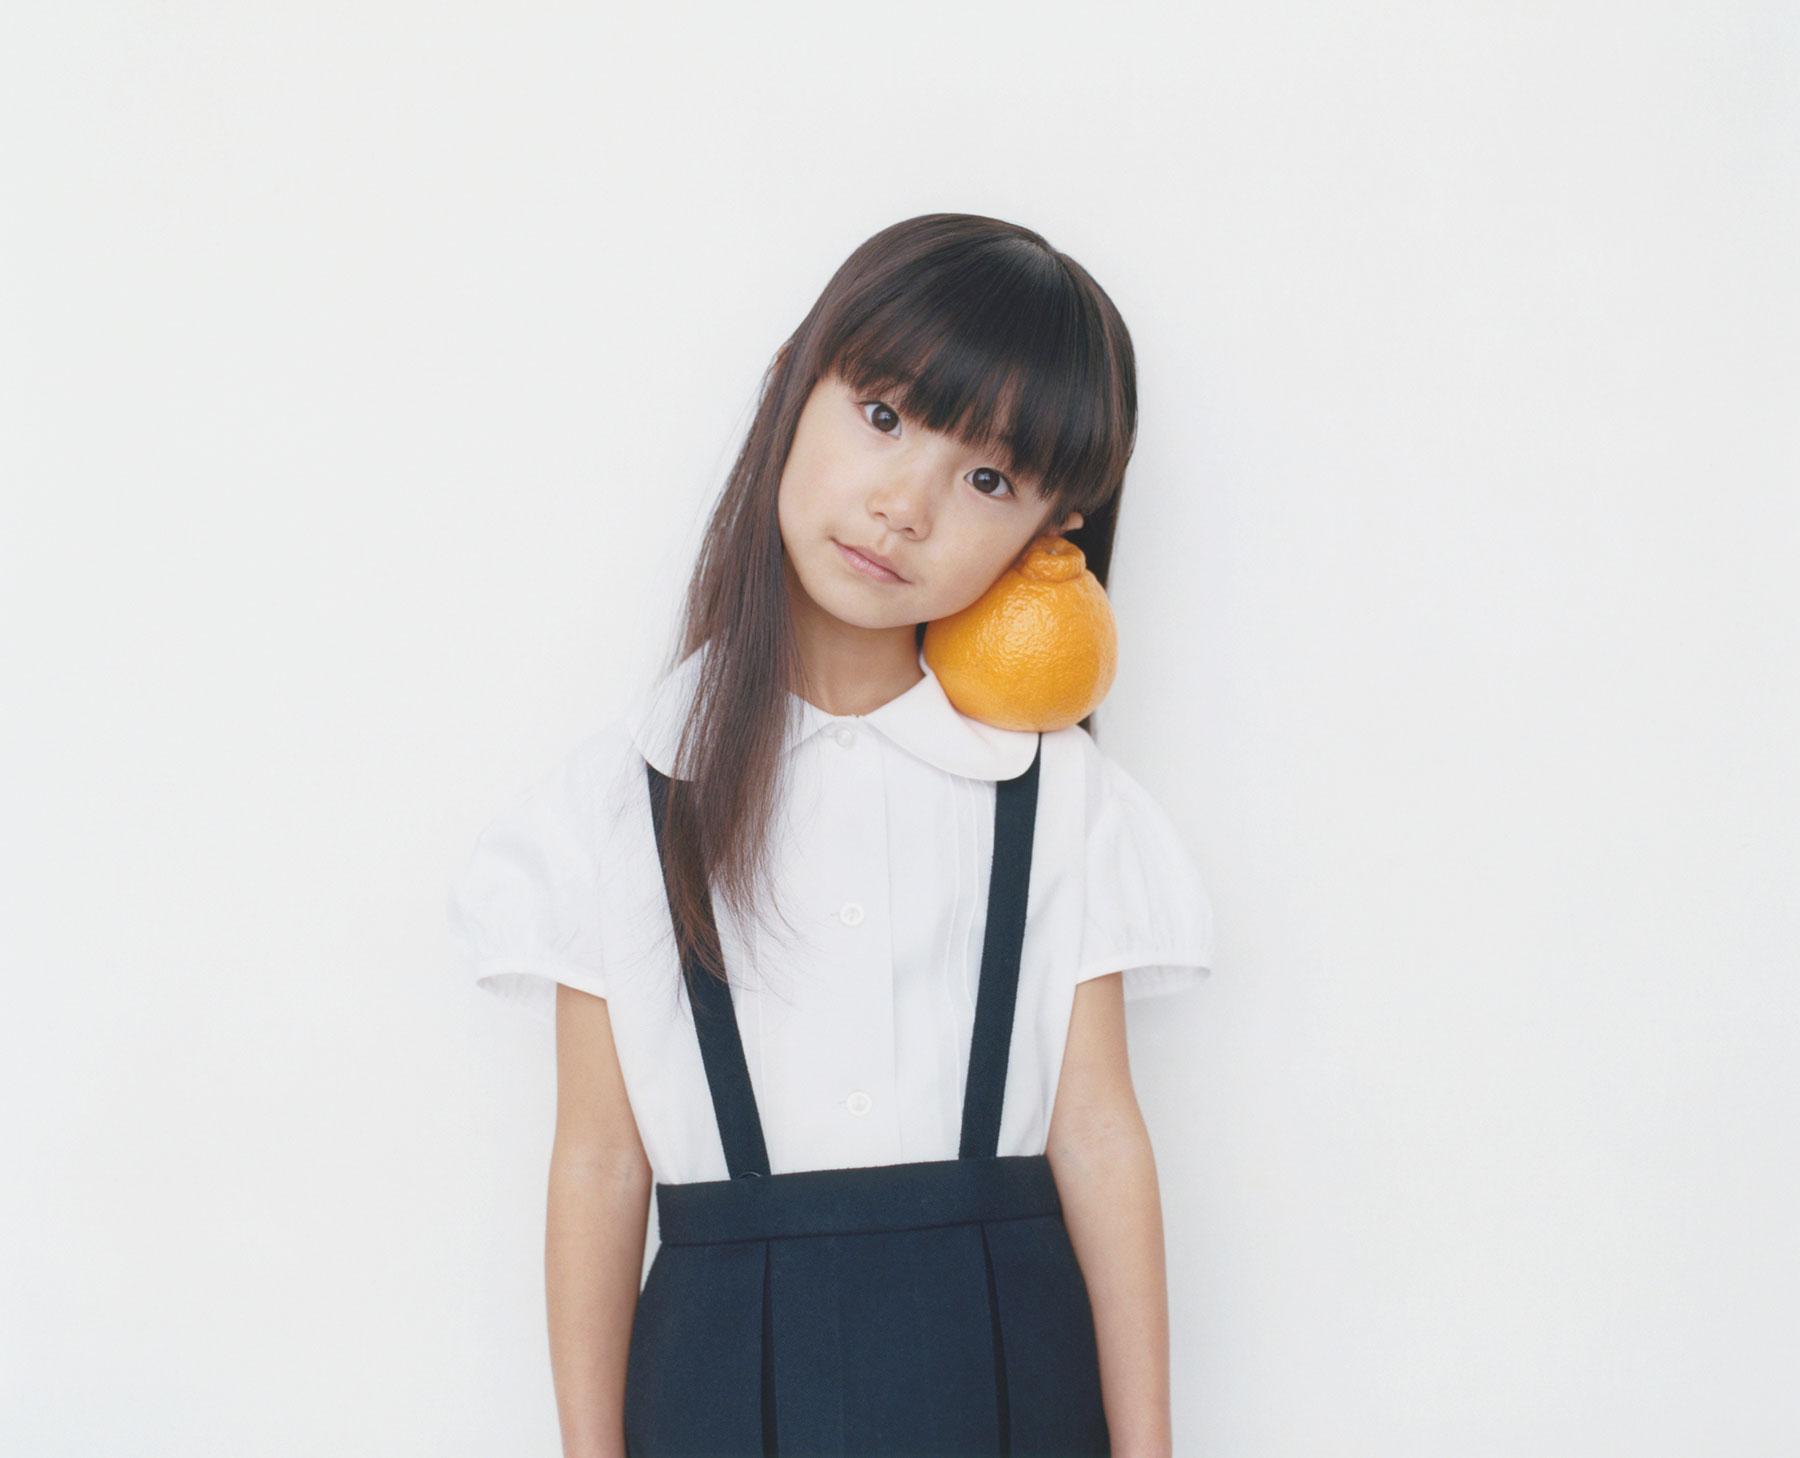 Osamu Yokonami,  1000 Children: Sumo Mandarin No. 72 , 2010-2013  Digital pigment print, 895 x 1105 mm (approx. 34.25 x 43.5 in), edition of 5; 146 x 168 mm (approx. 5.75 x 6.6 in), edition of 10   Inquire